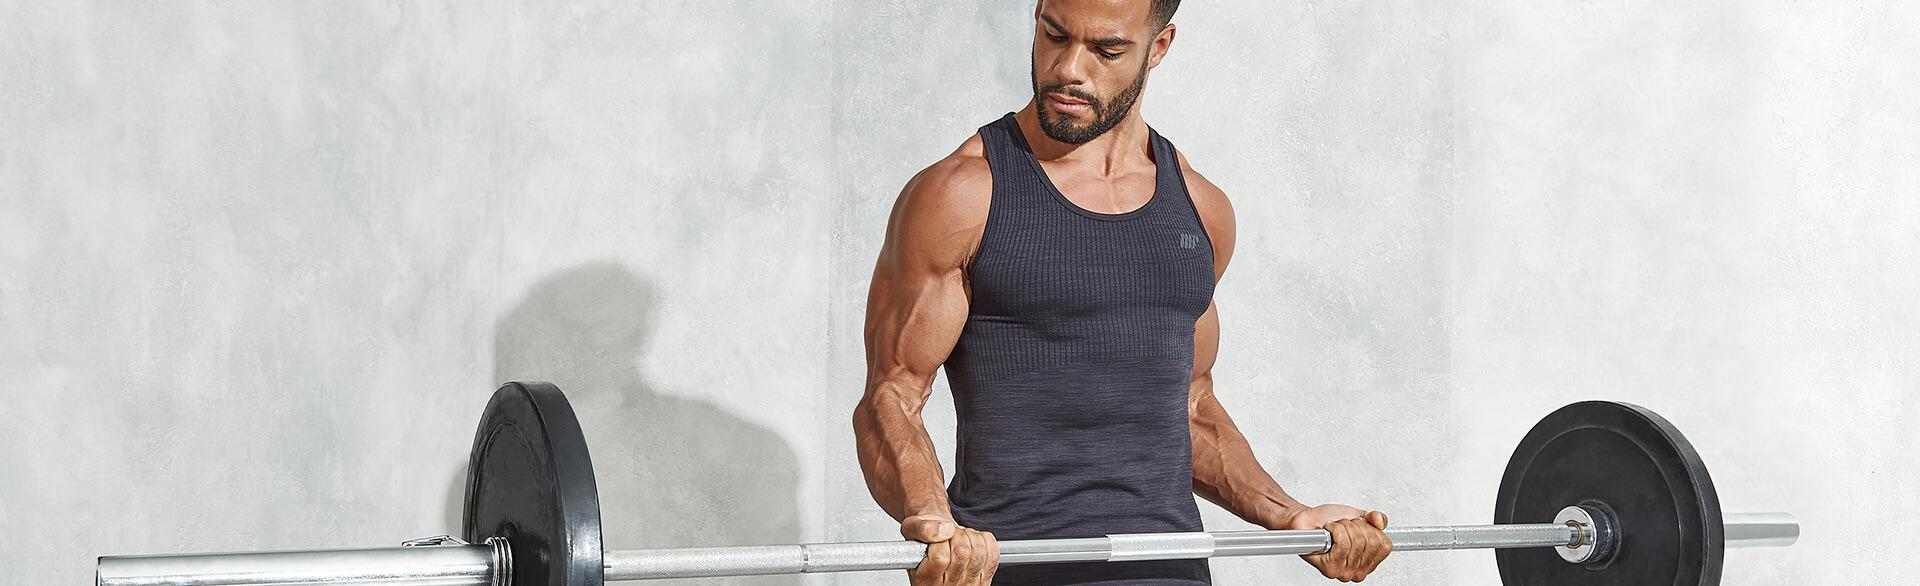 Bygg muskler & styrka